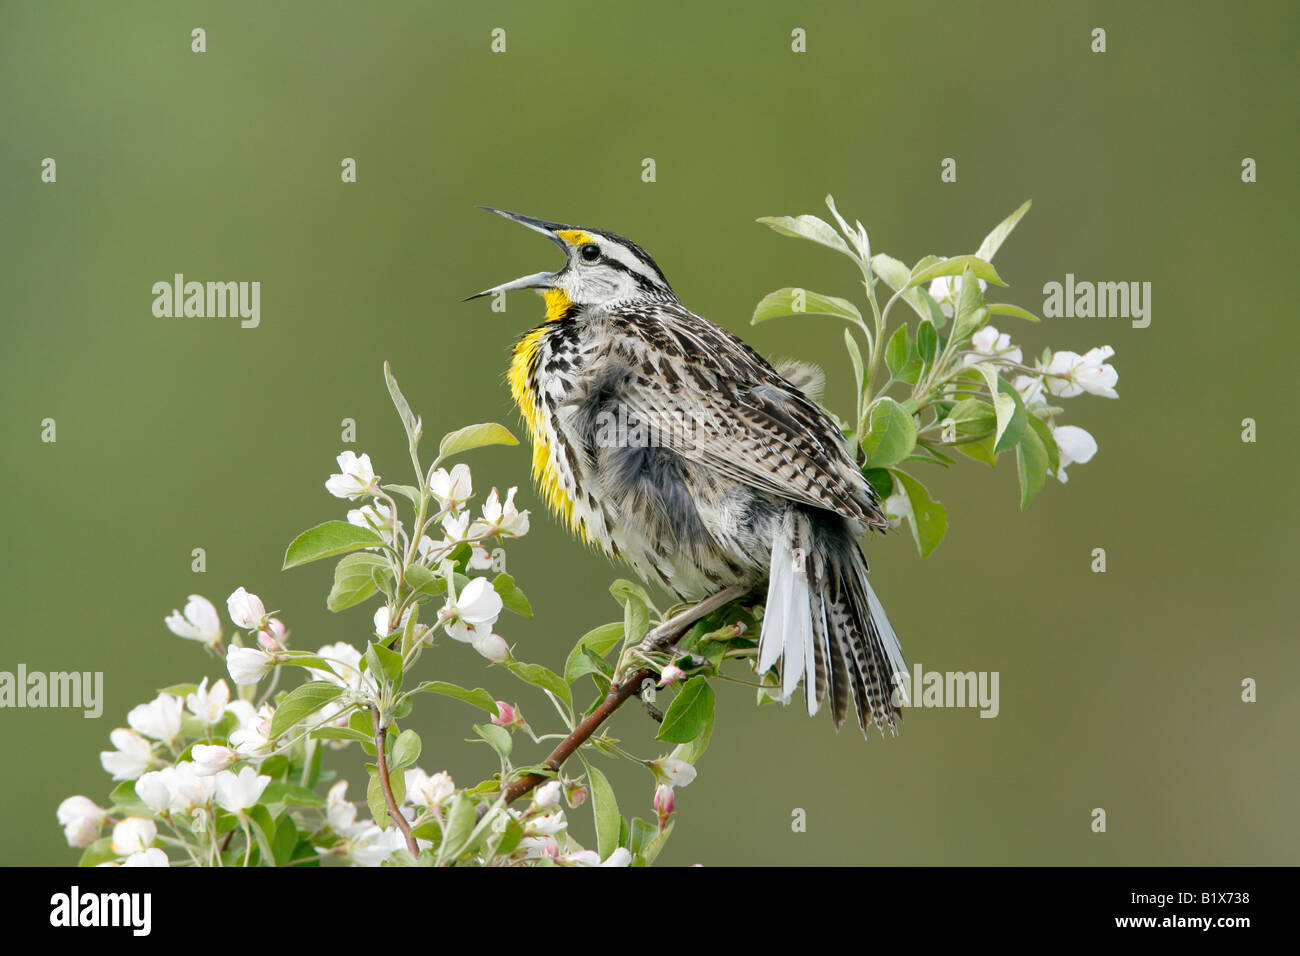 Eastern Meadowlark Singing in Apple Tree Blossoms - Stock Image